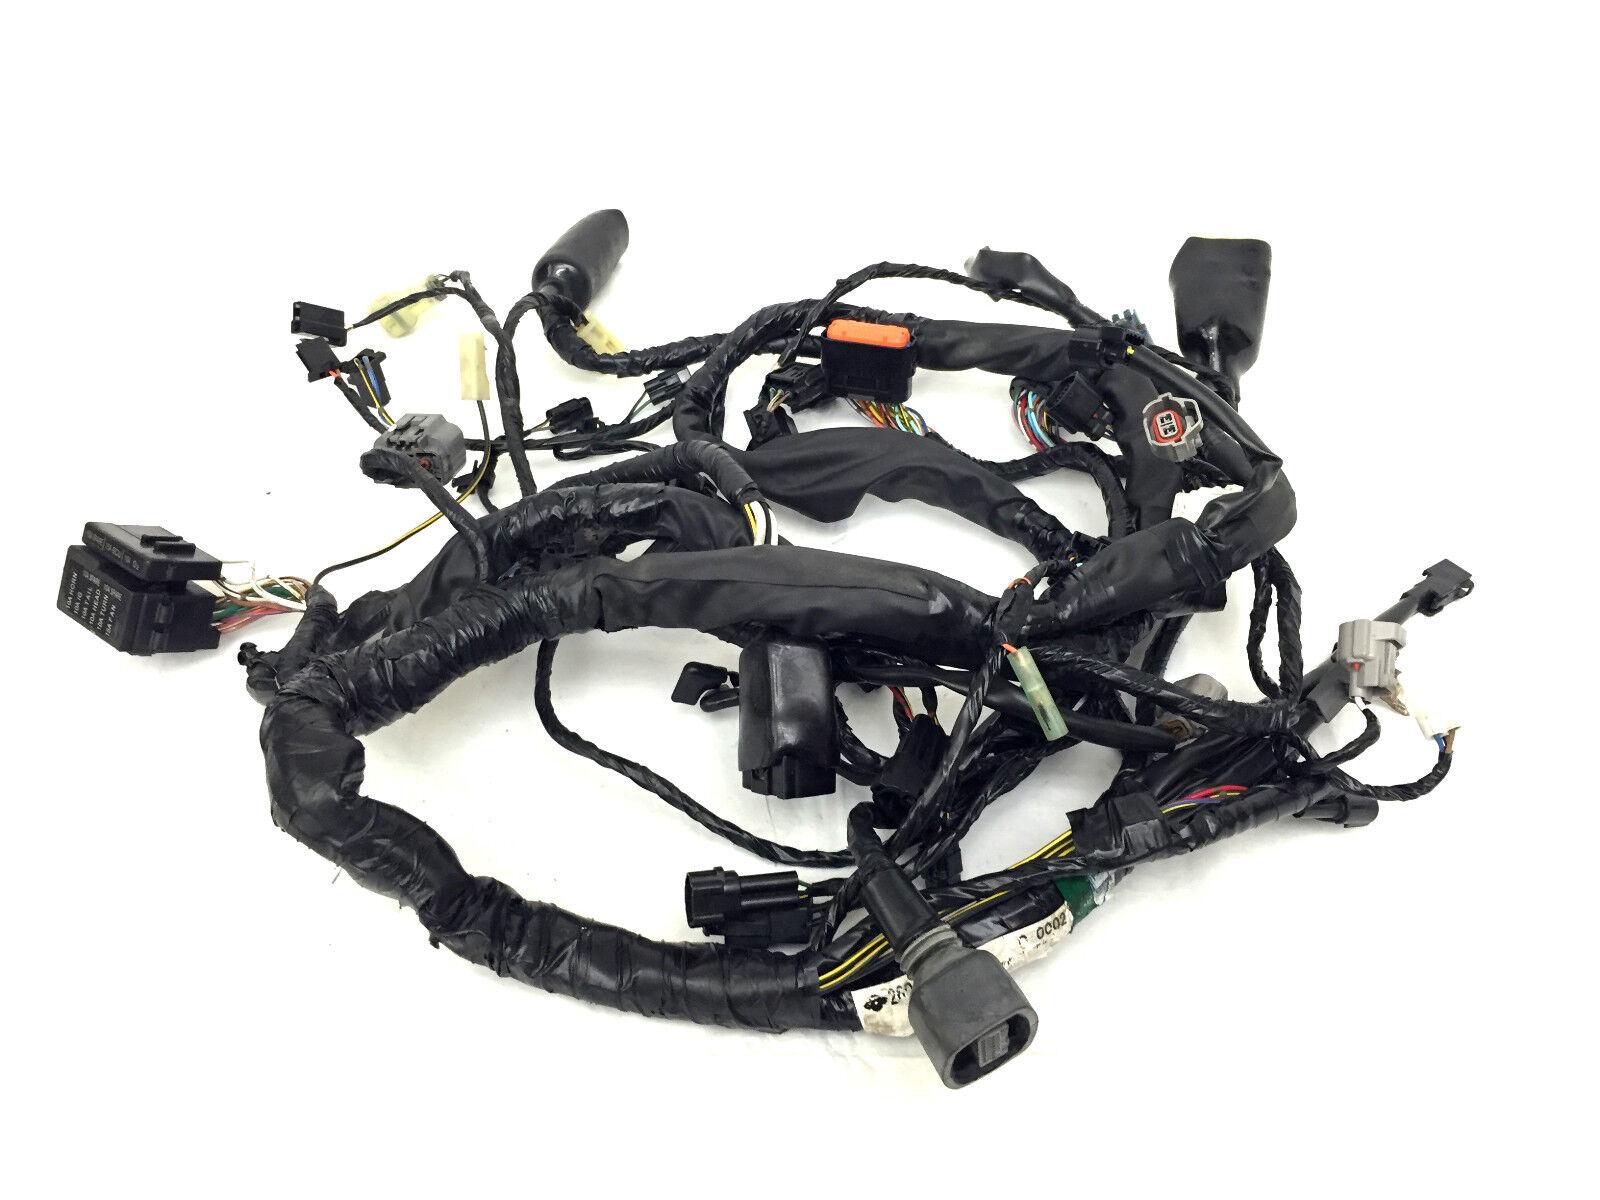 Kawasaki Ninja 650r Wiring Harness Schematic Diagrams Engine Diagram 2009 Main Motor Wire Loom 300cc